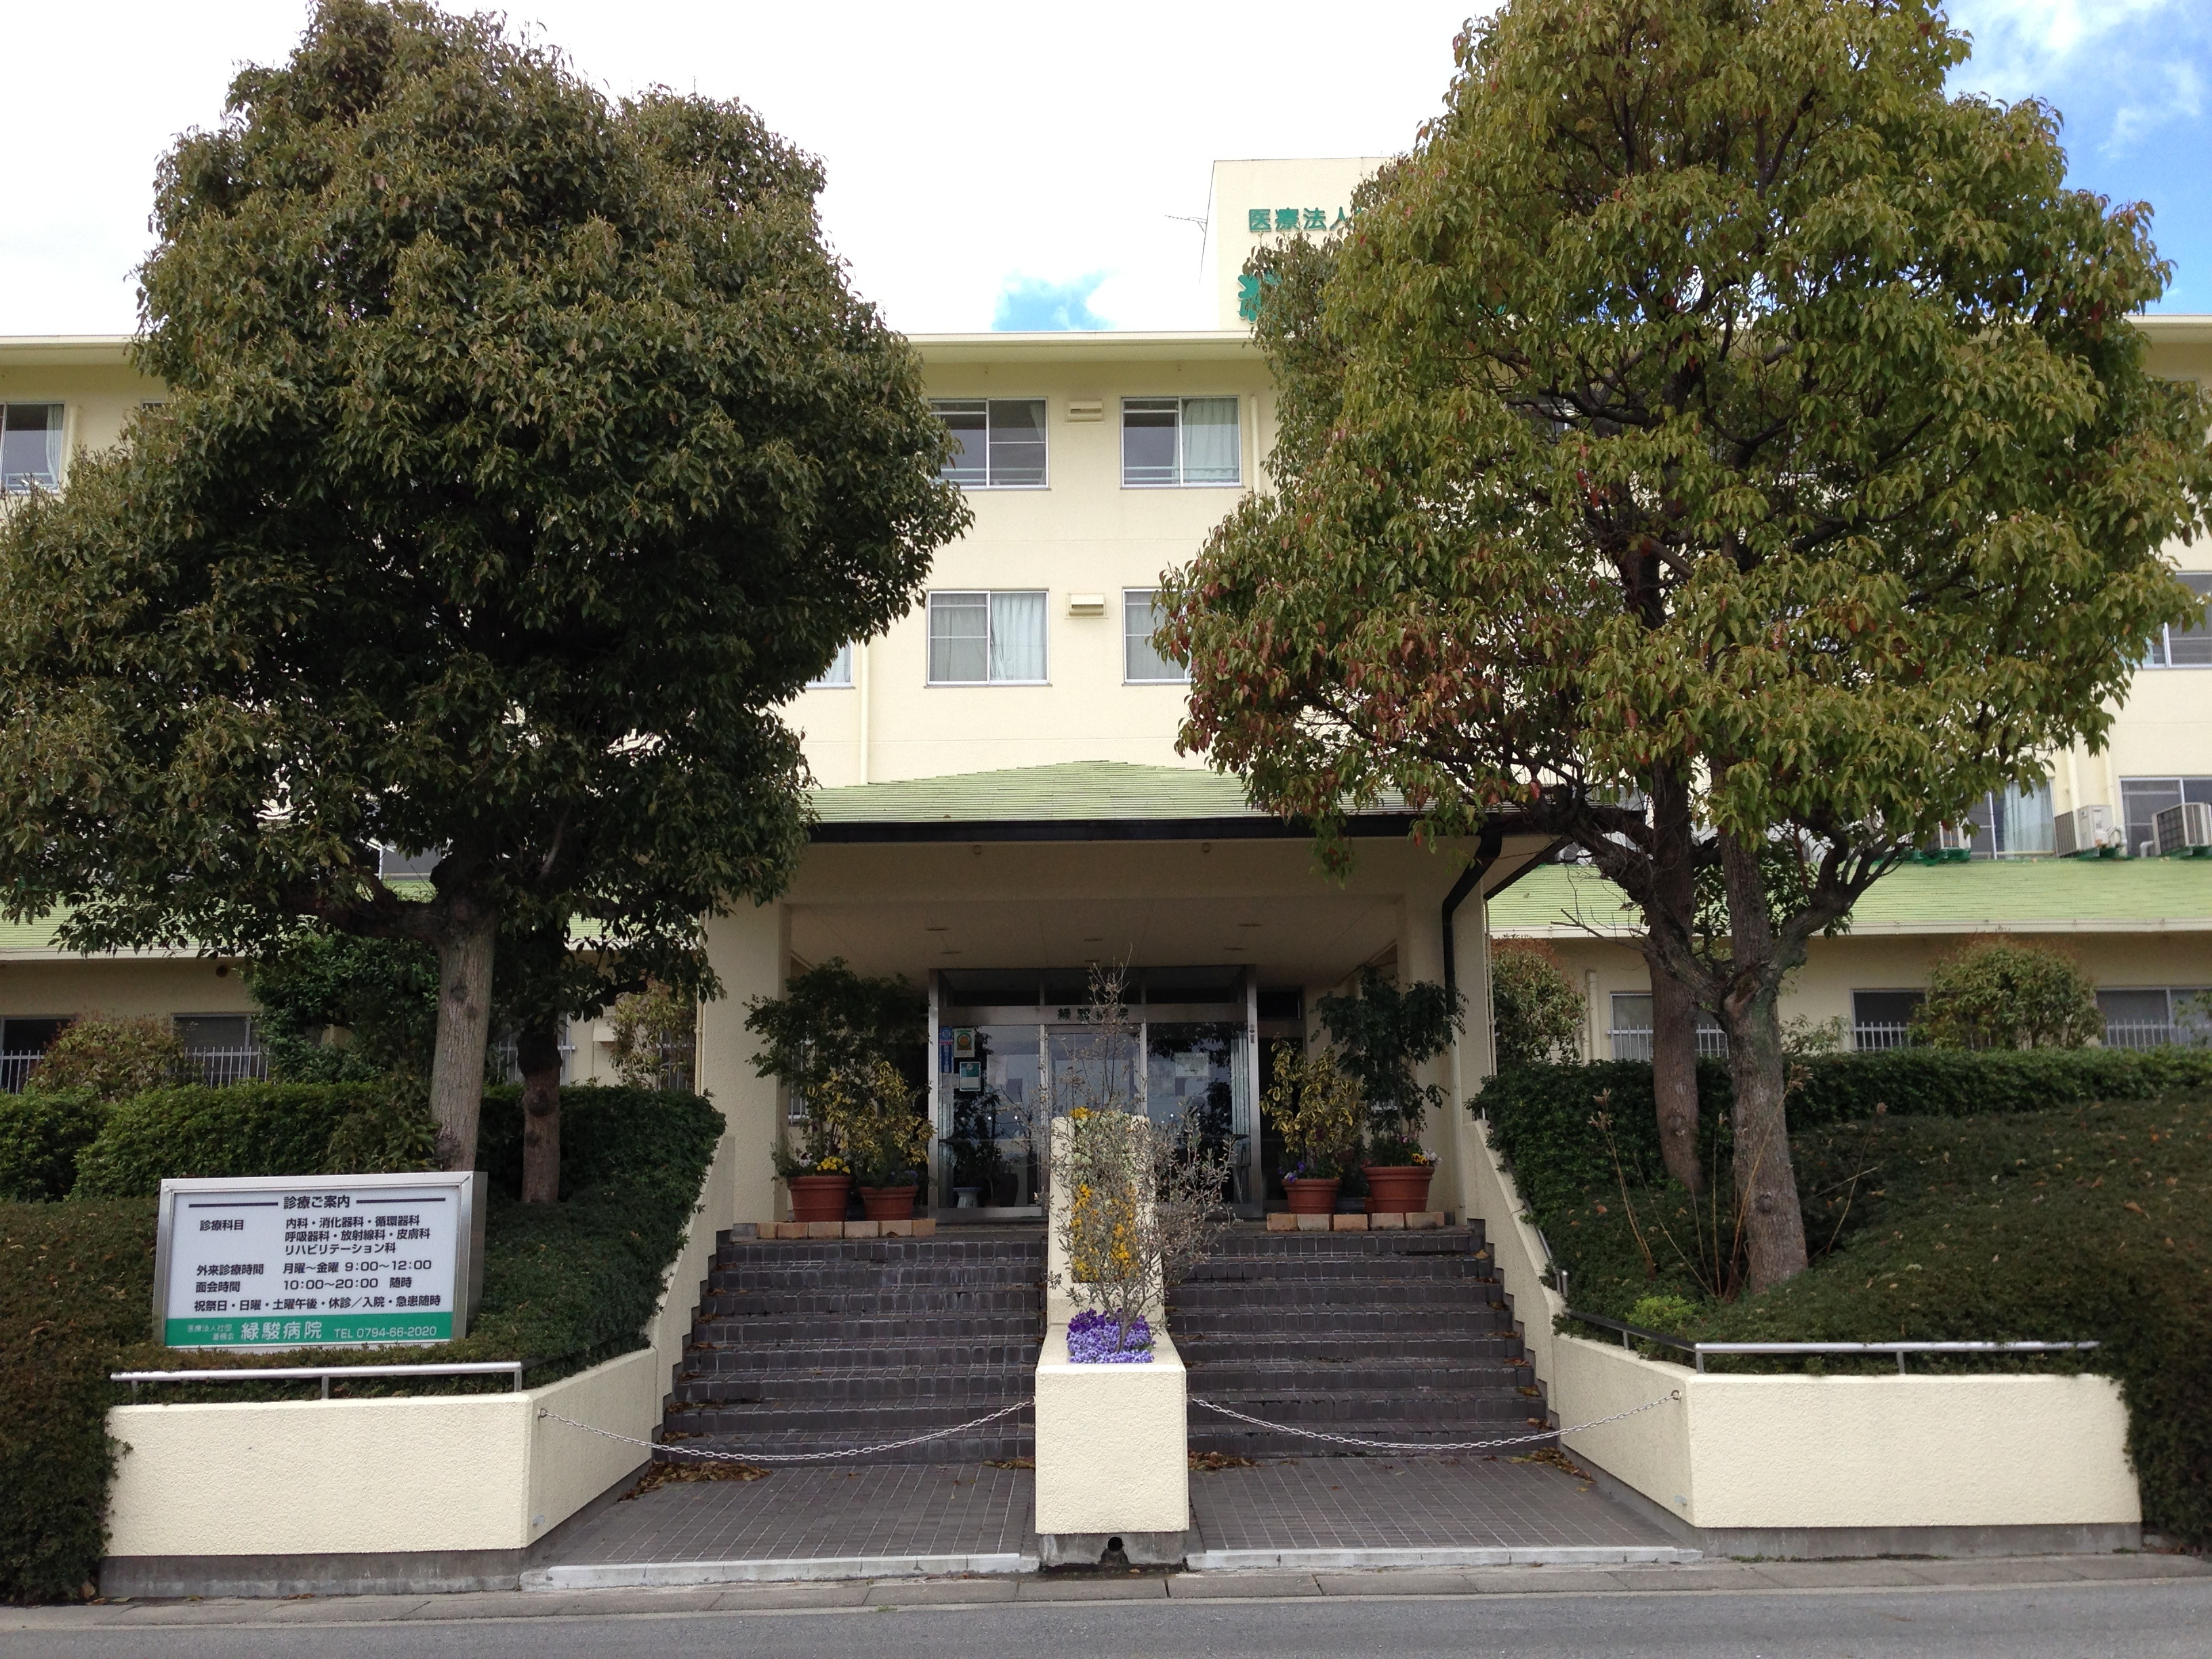 緑駿病院の写真1001